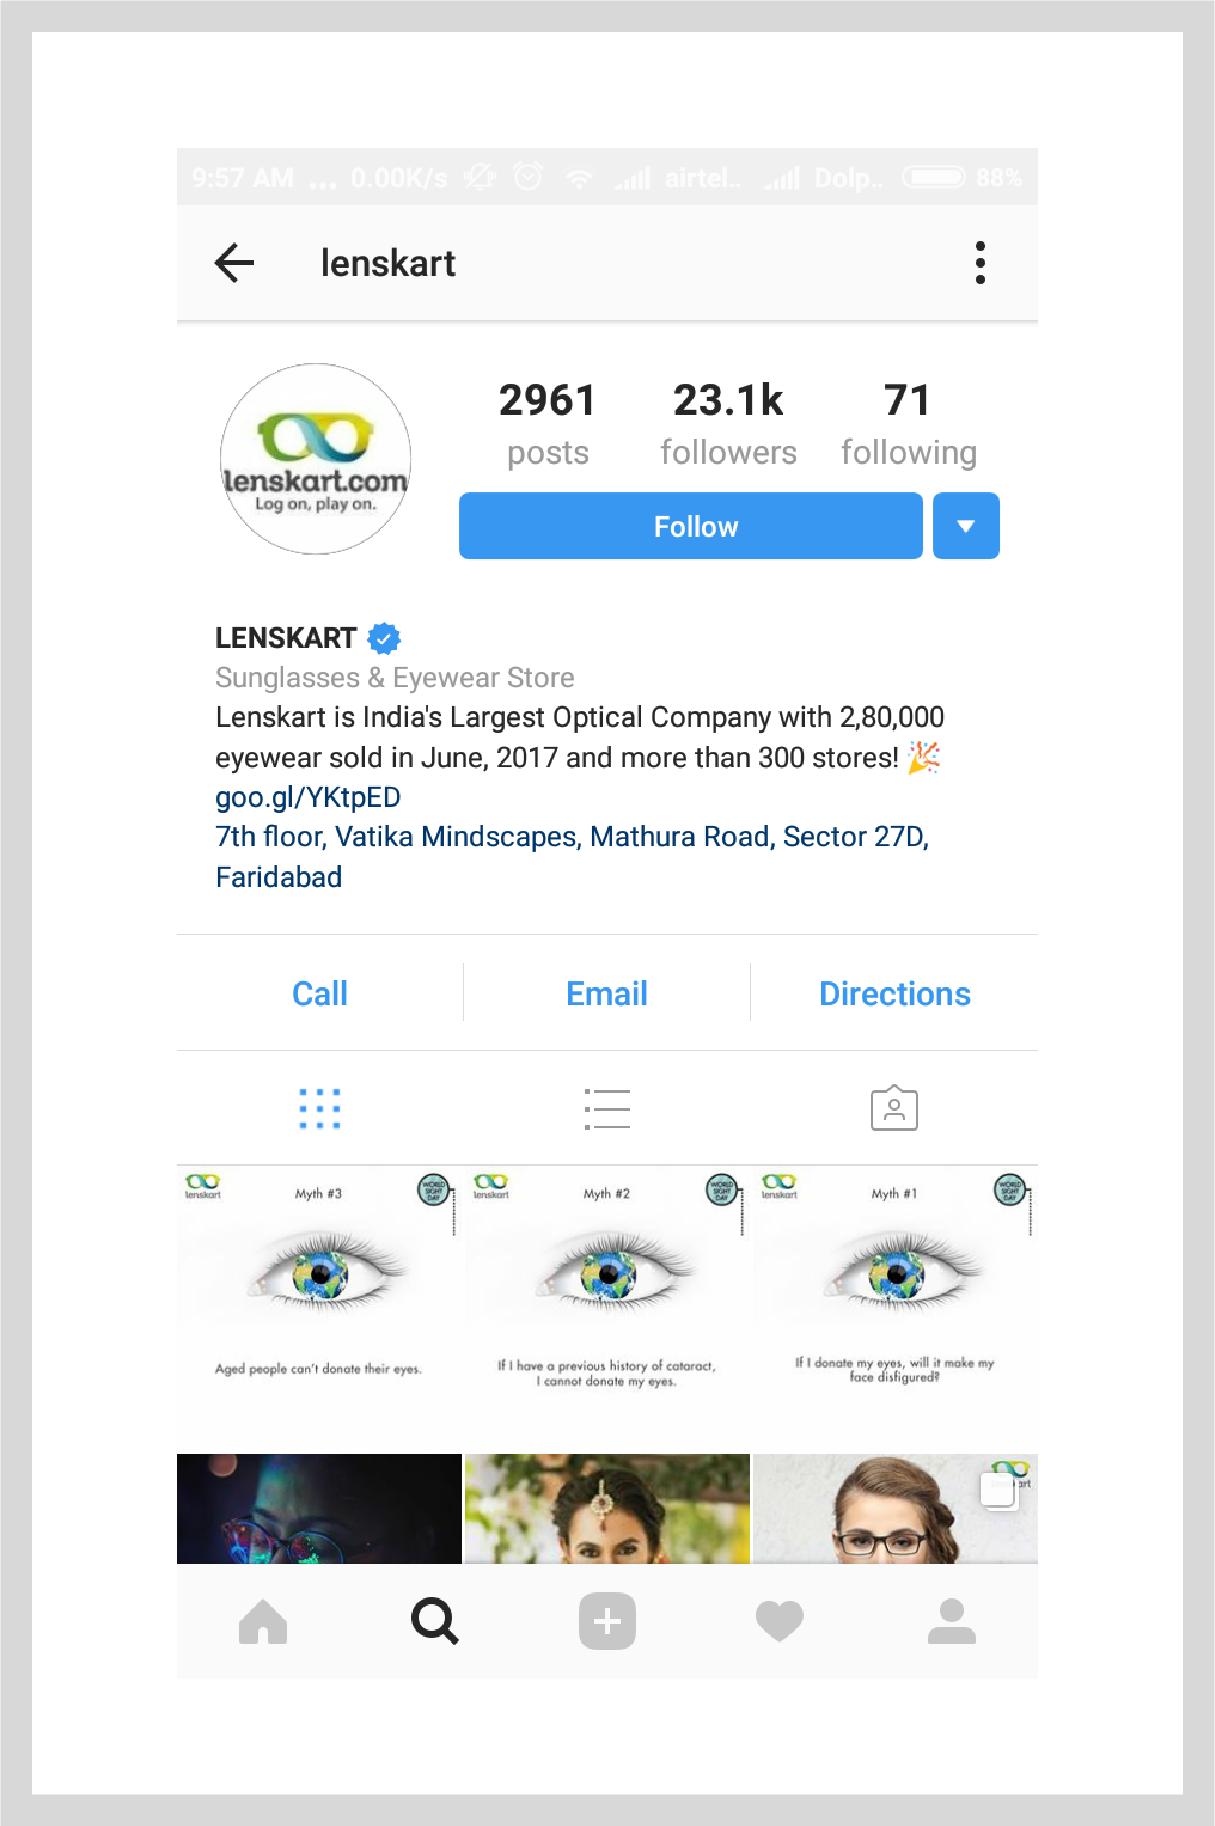 How to improve your Instagram Marketing performance - Quora